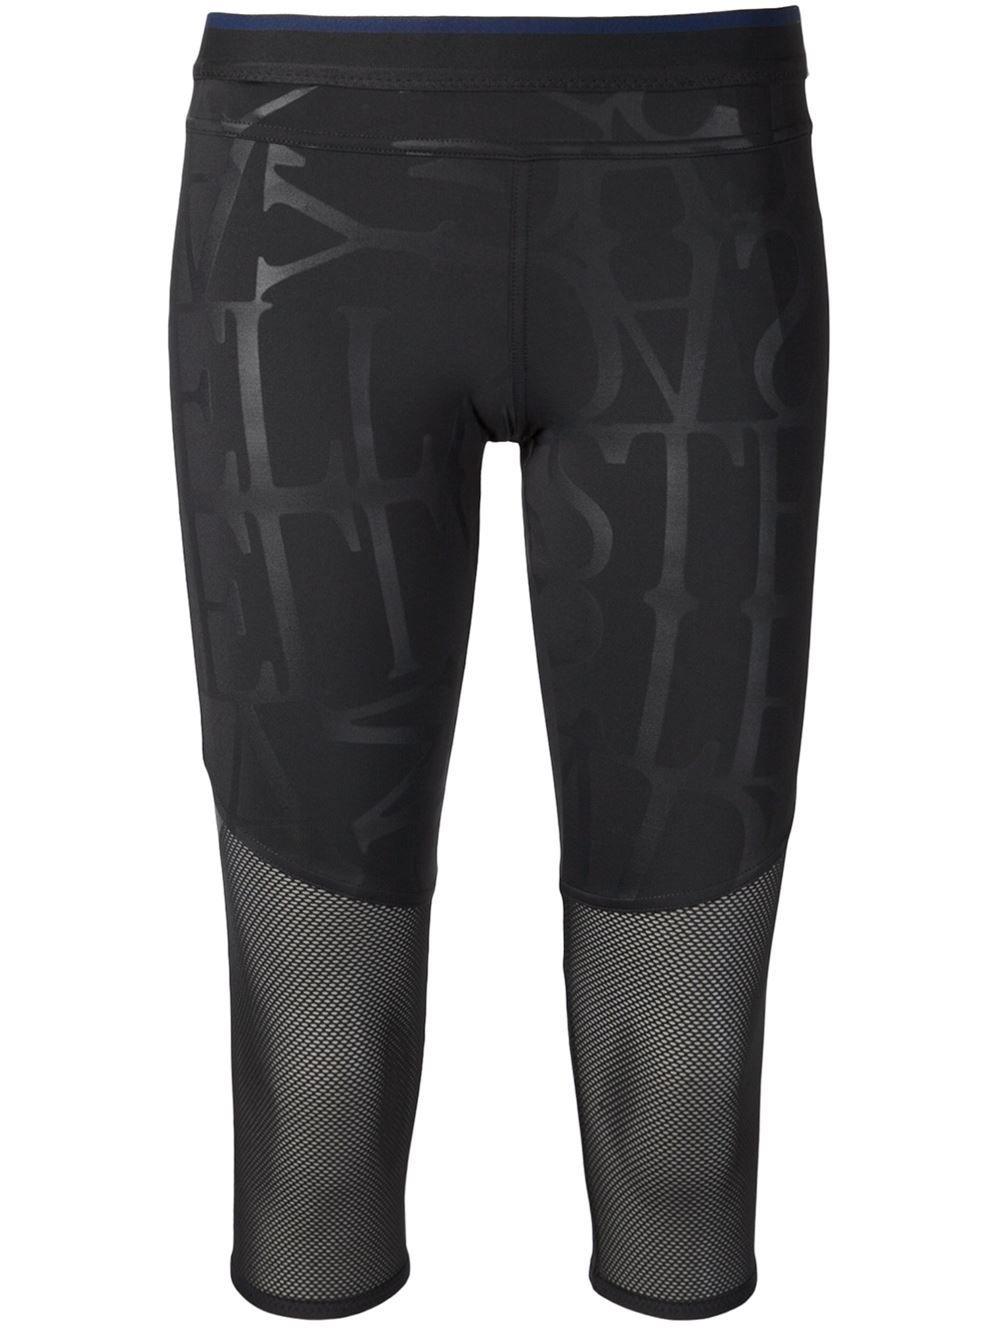 Adidas By Stella Mccartney 'running Performance' Leggings - Torregrossa - Farfetch.com